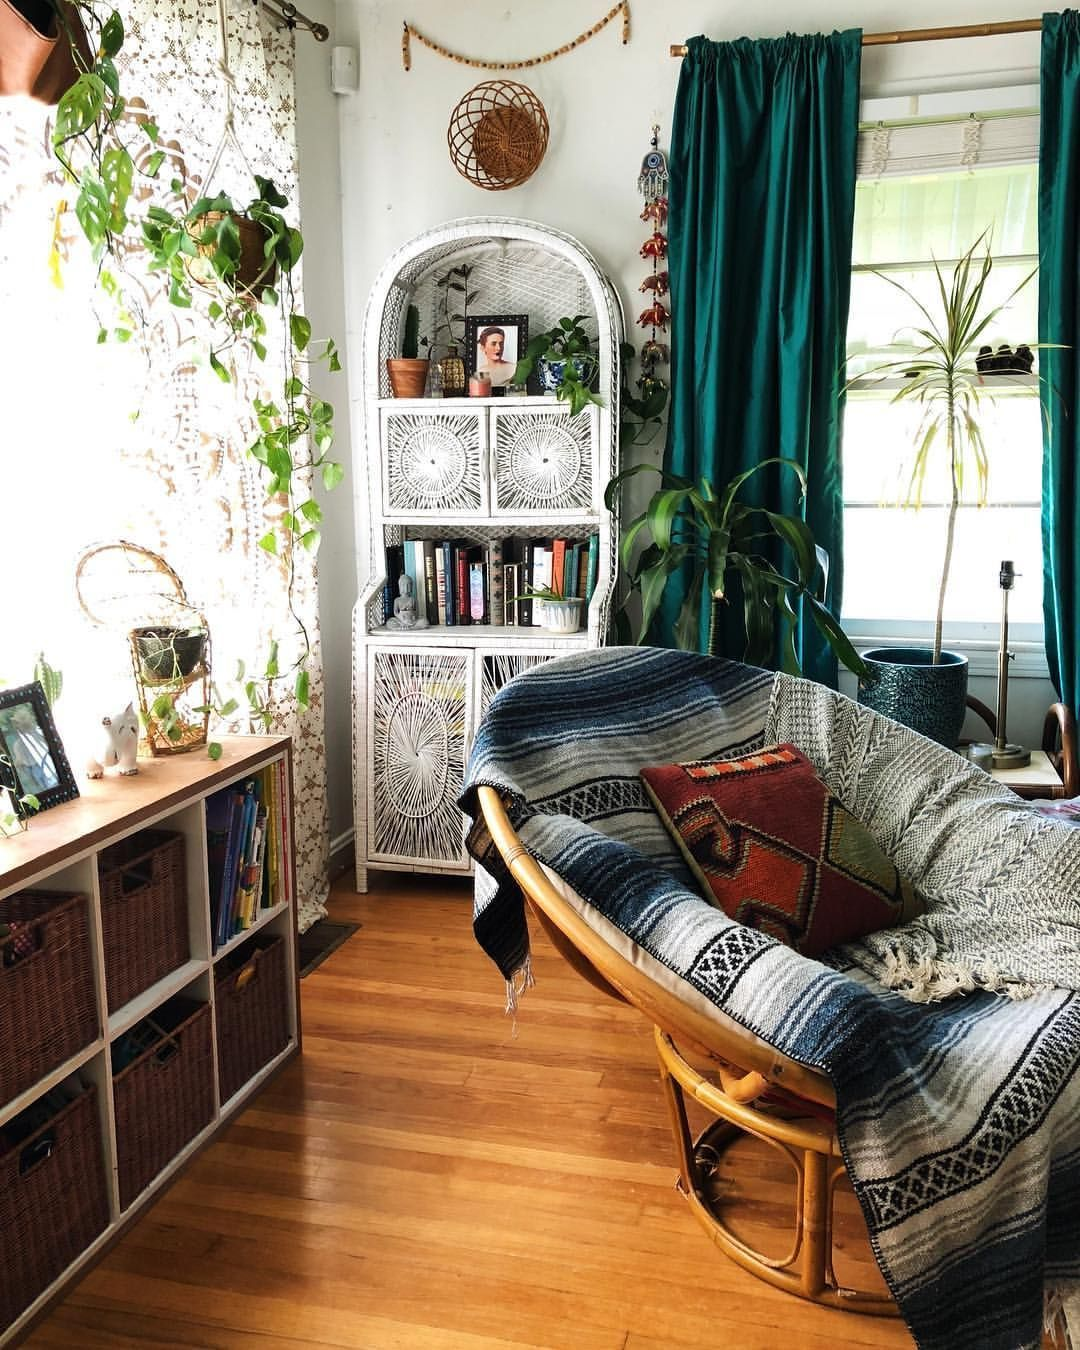 Room Decor Decorideasaccentsaccessories Bedroom Designs Room Decorating Ideas You Ll Love Houseplant Home Decor Inspiration Home Bedroom Design